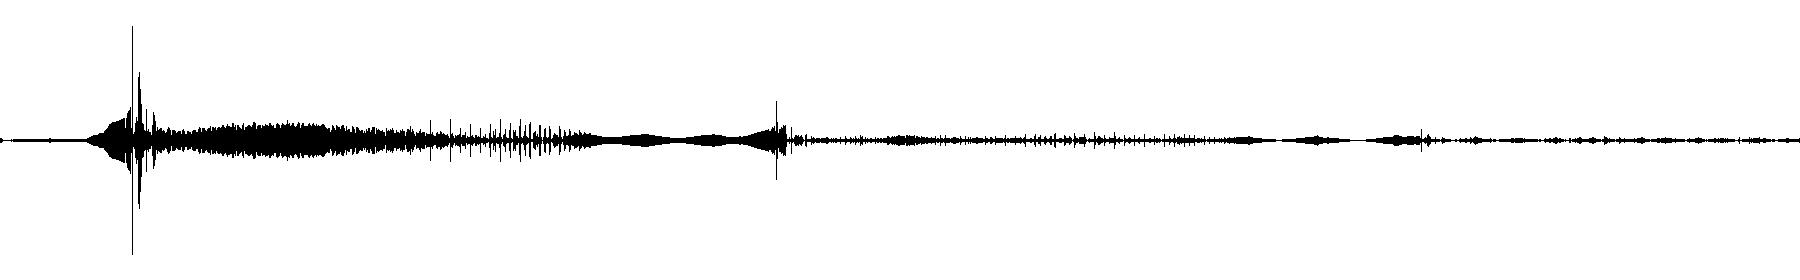 biab glitchhop blip 12